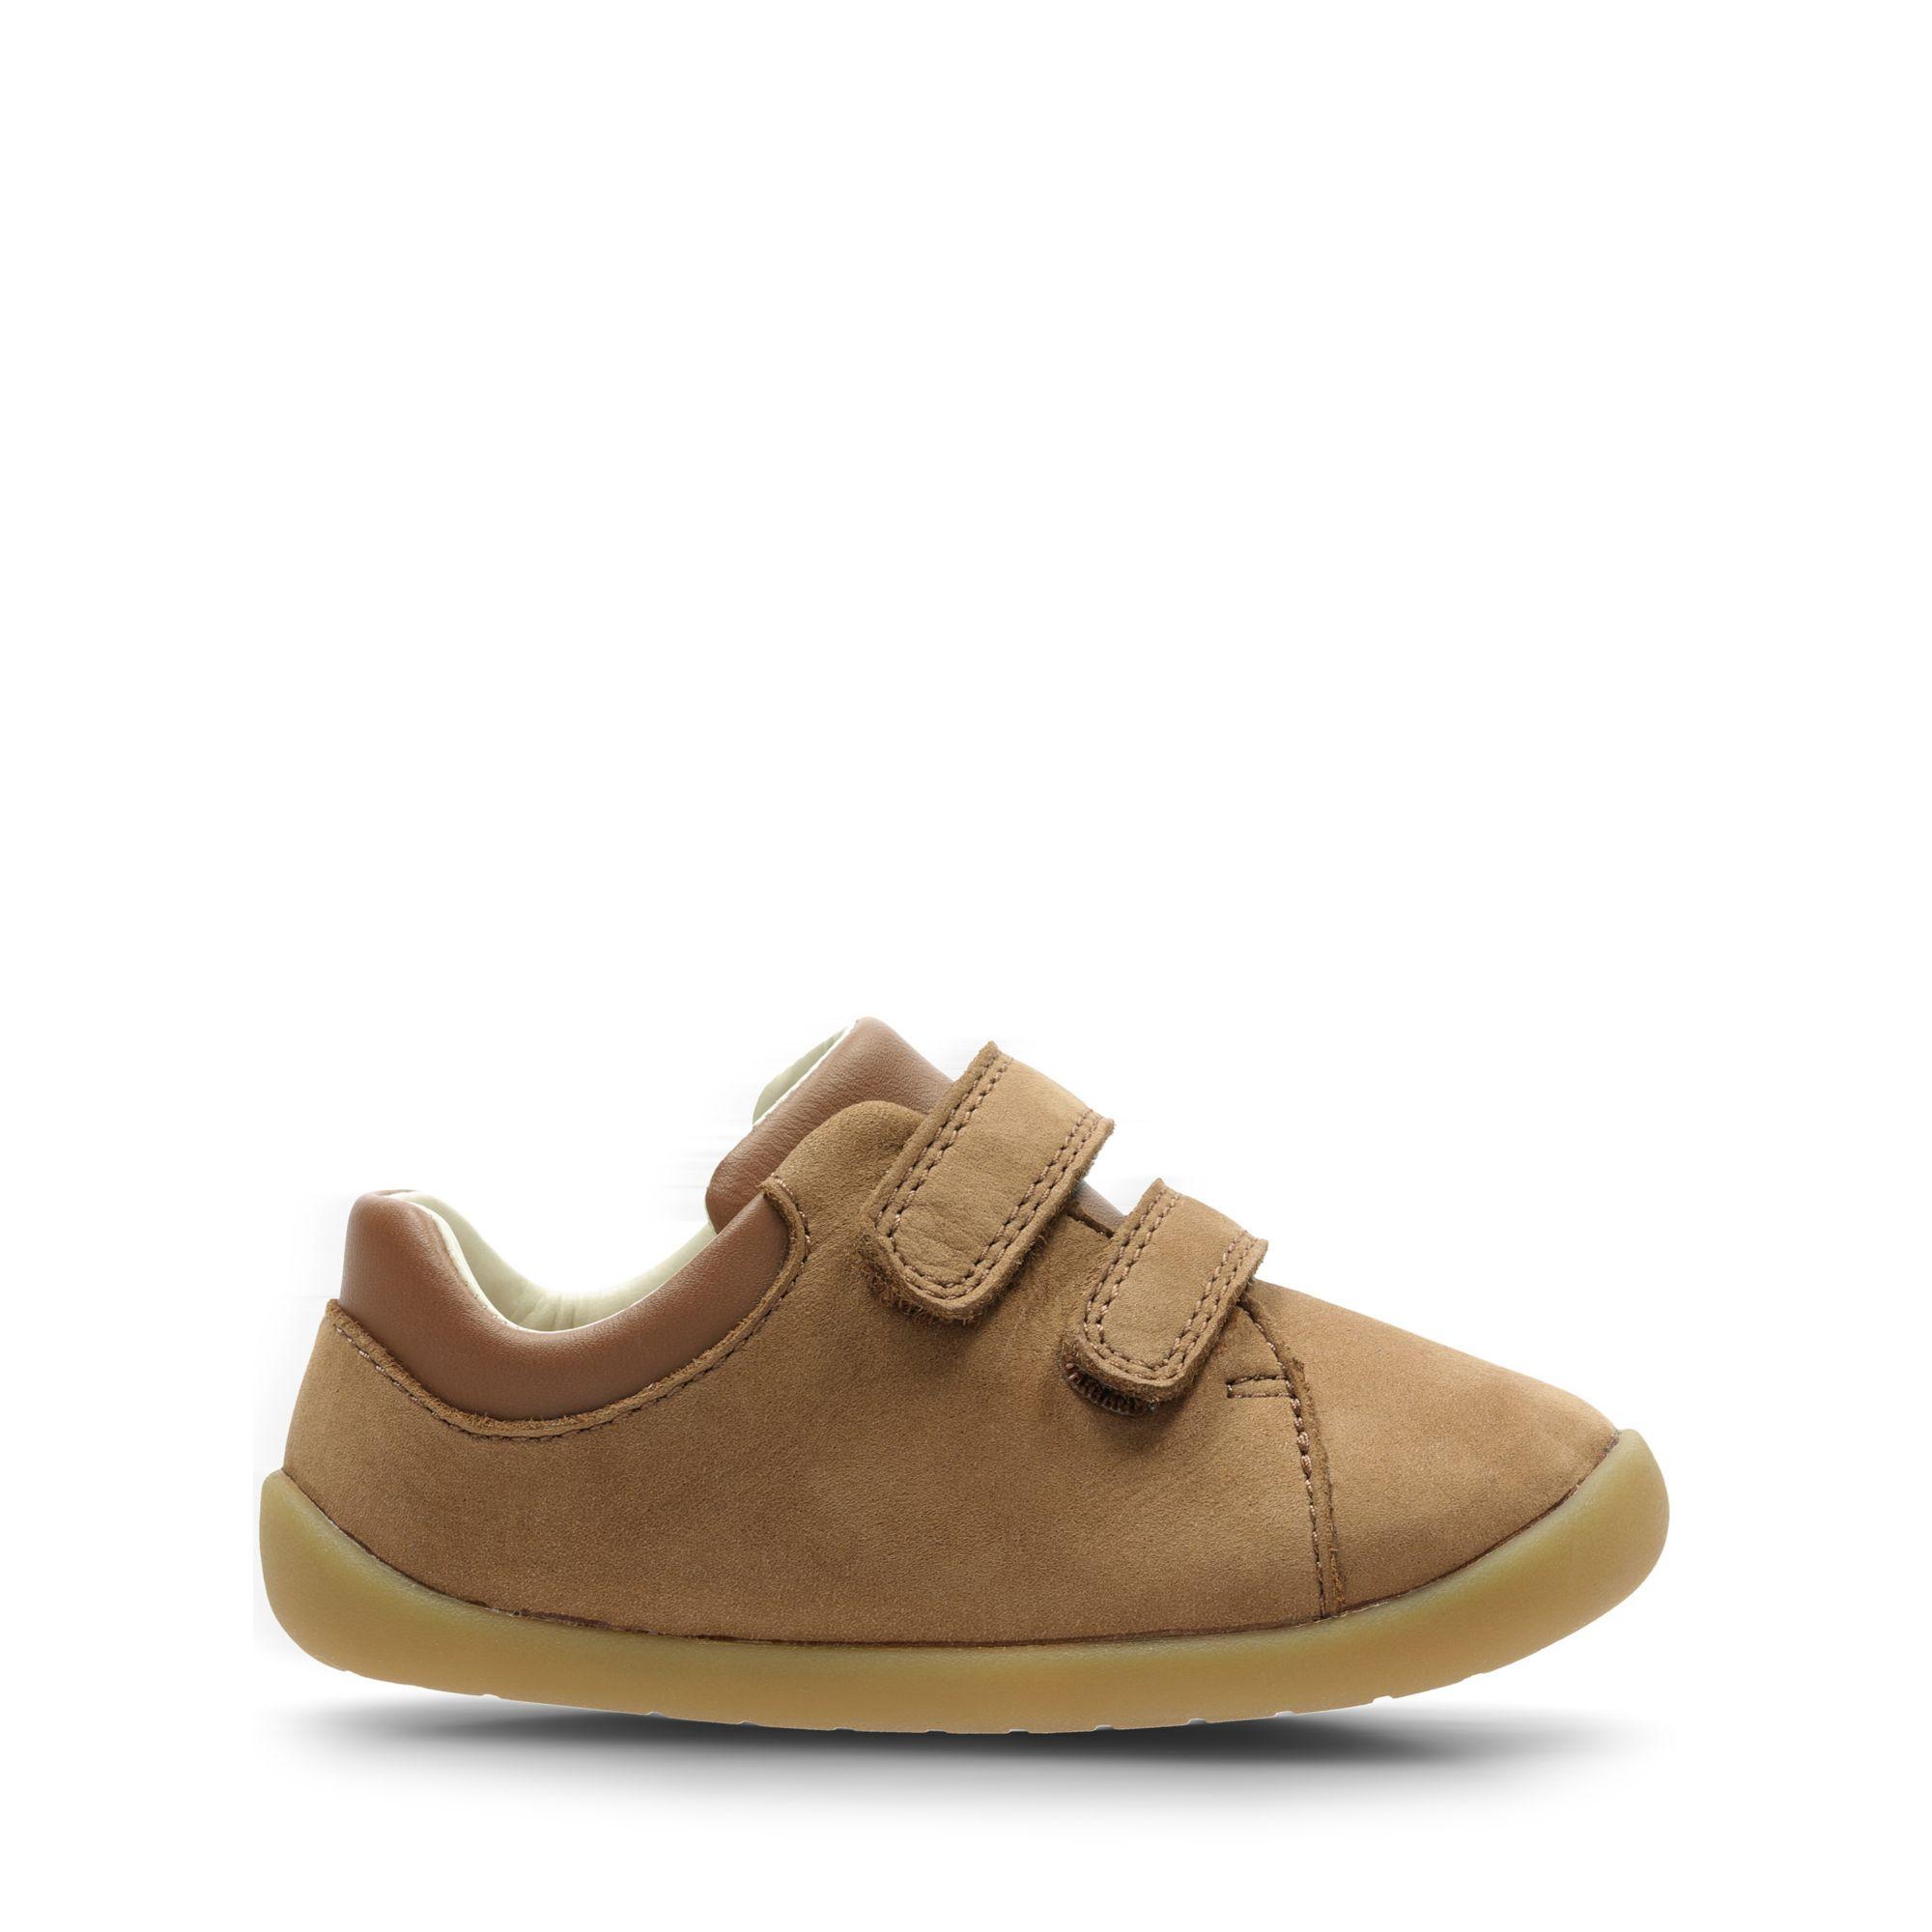 Clarks Roamer Craft Toddler – Leather